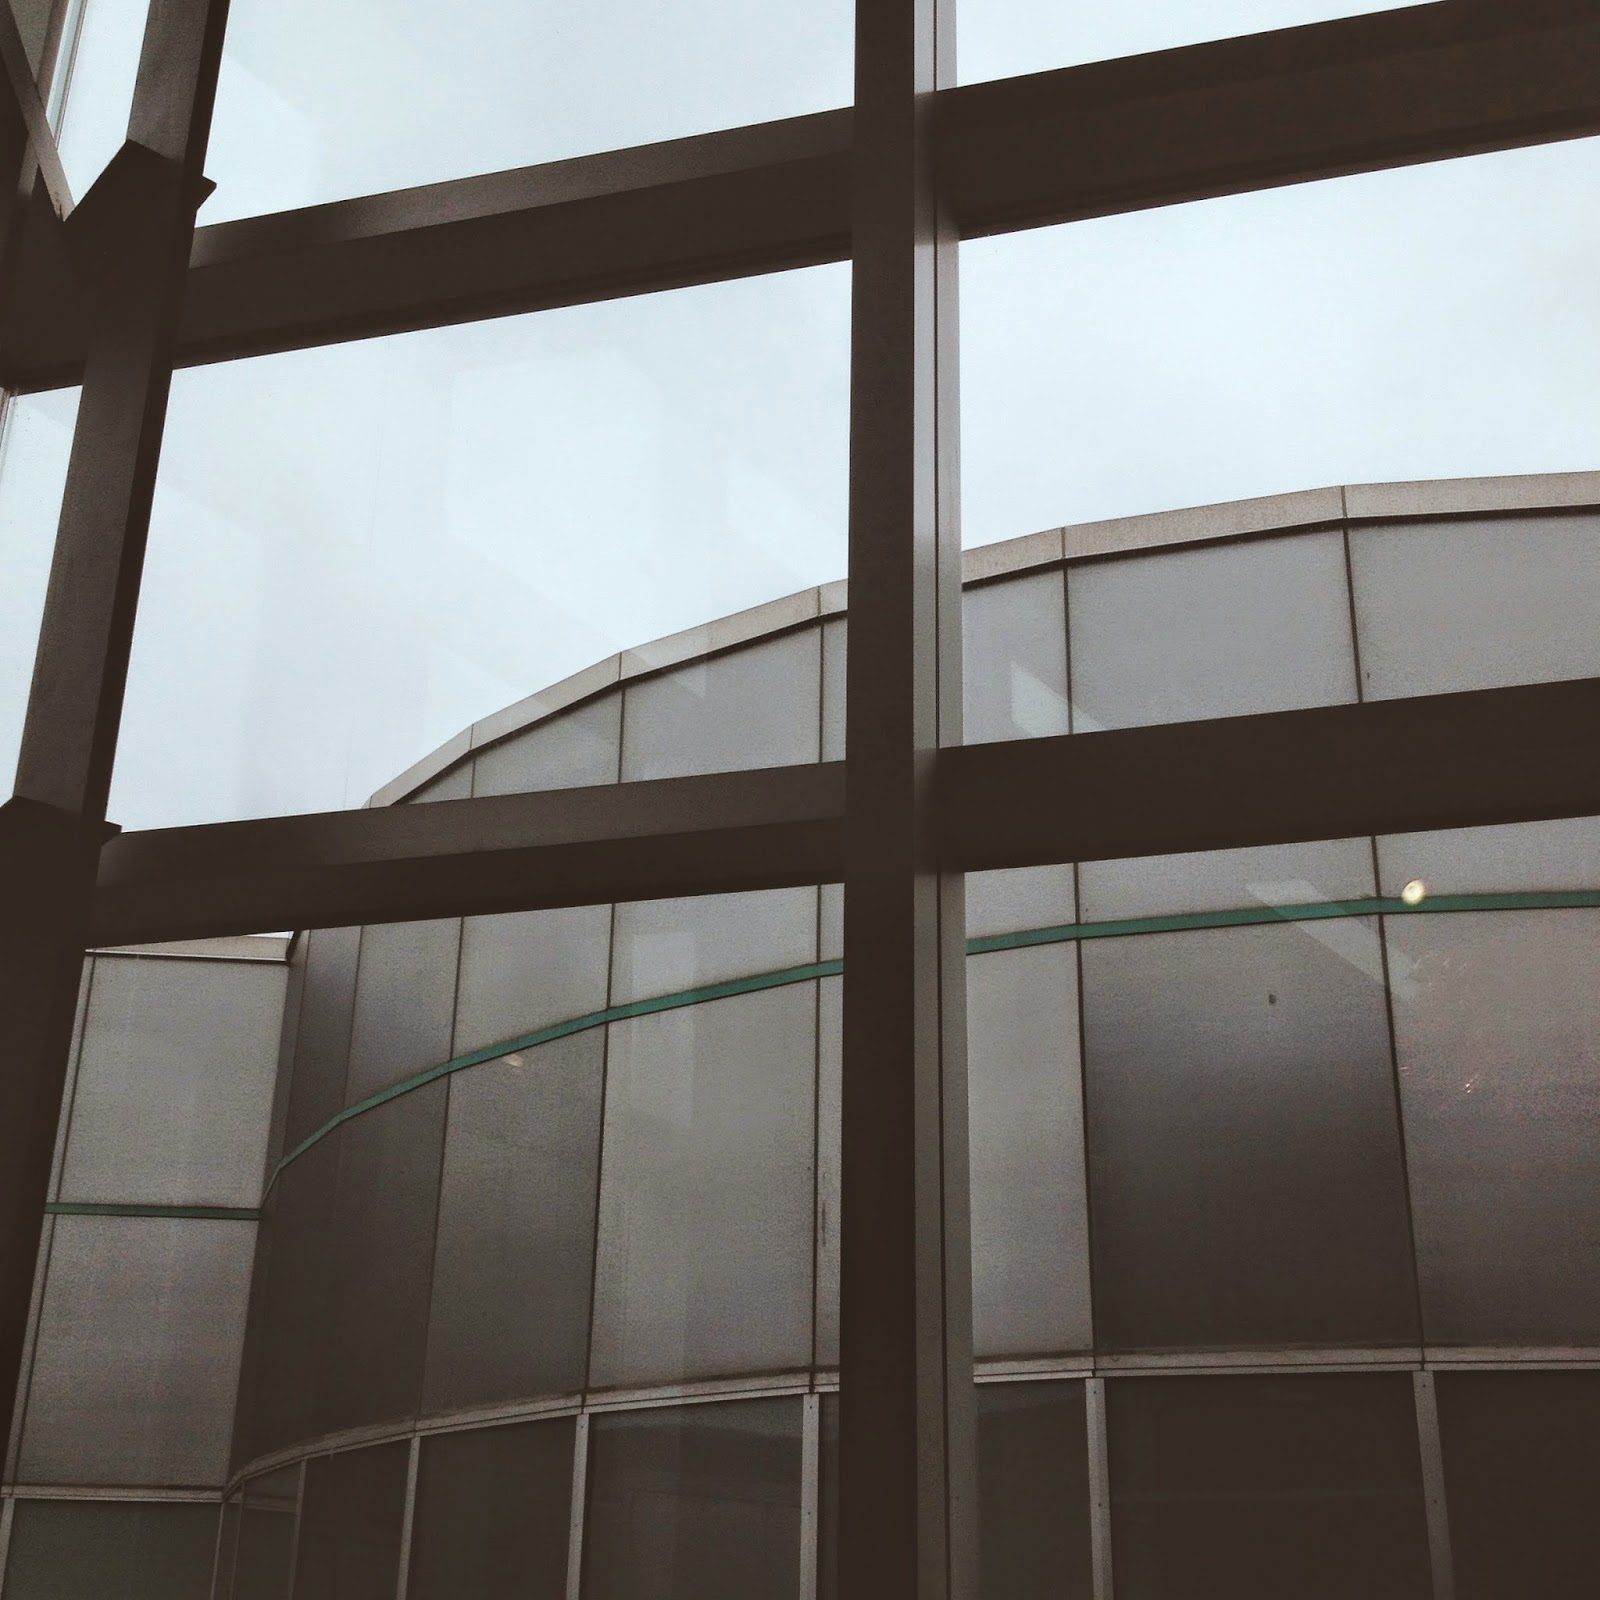 Corning Museum of Glass window view